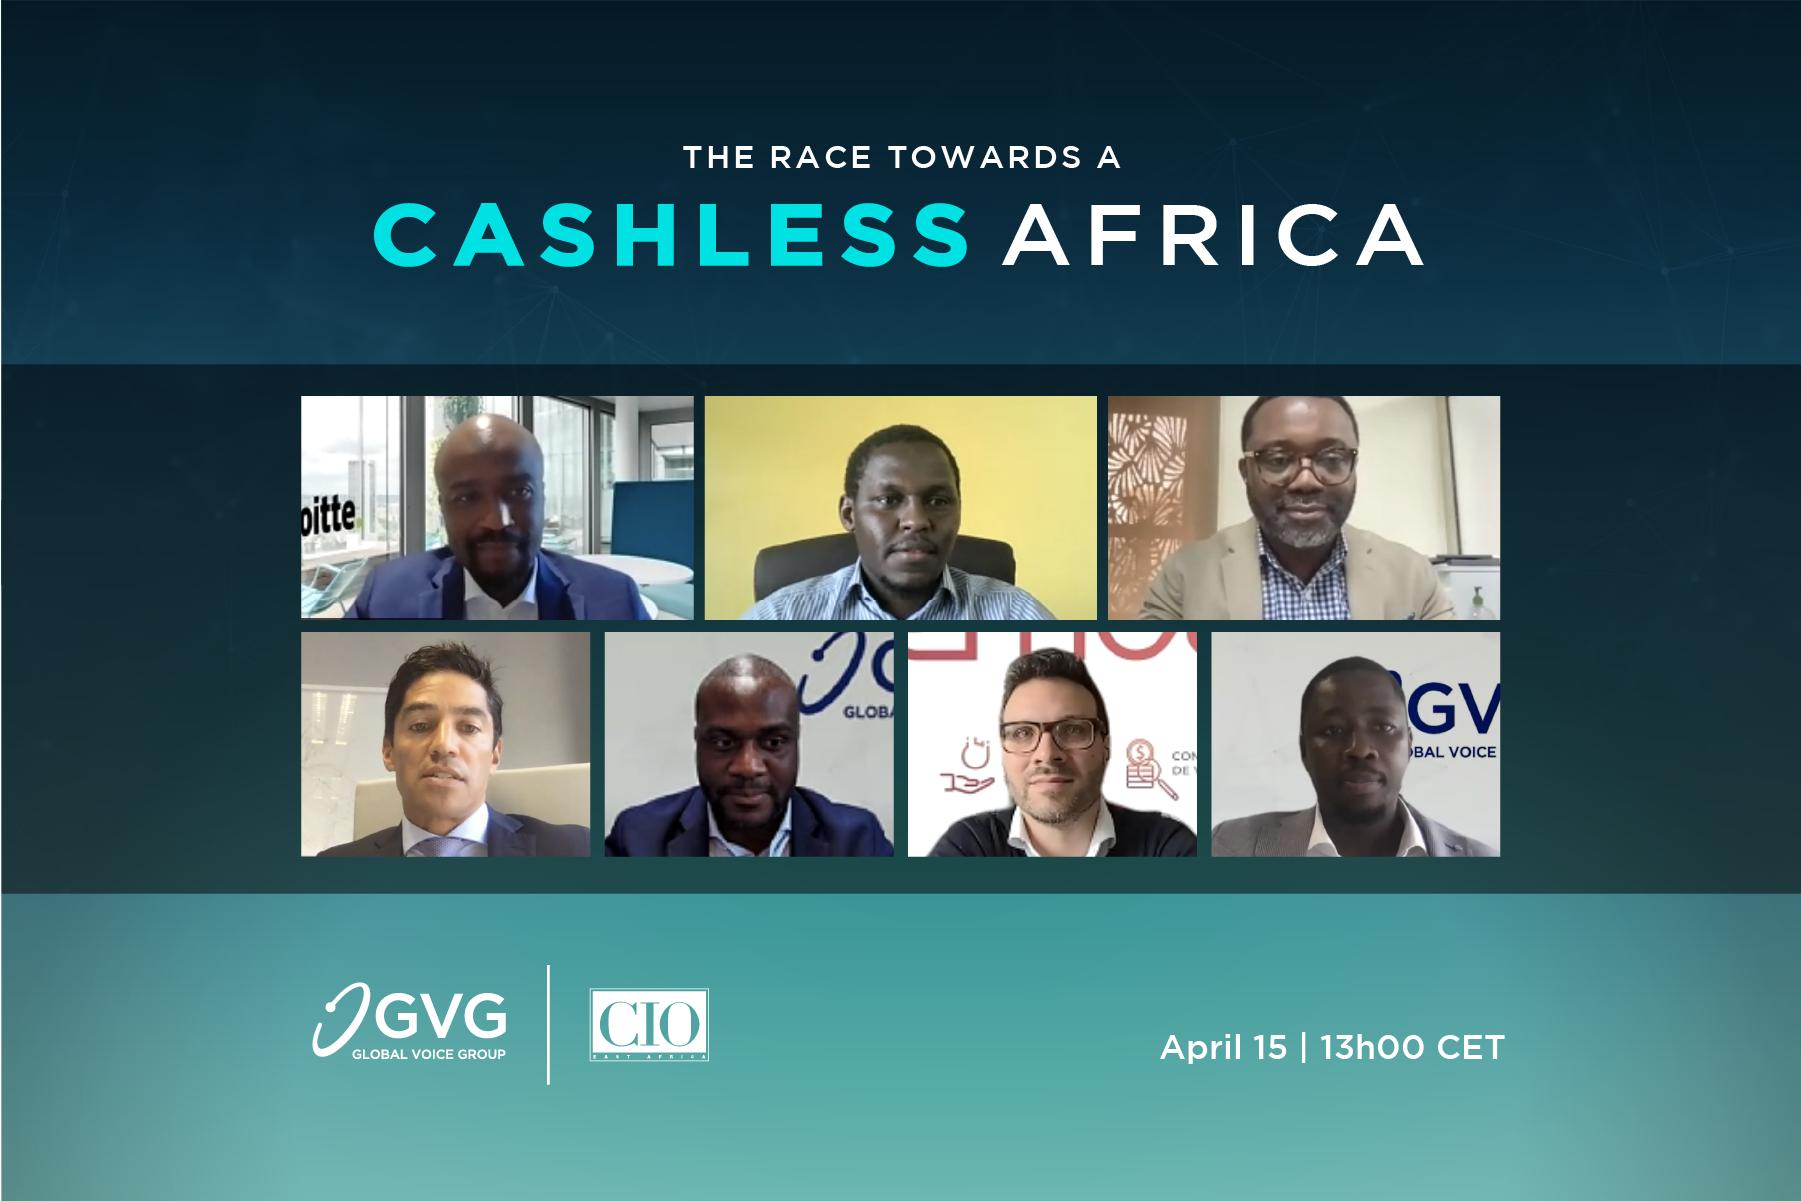 The Race Towards A Cashless Africa Webinaire